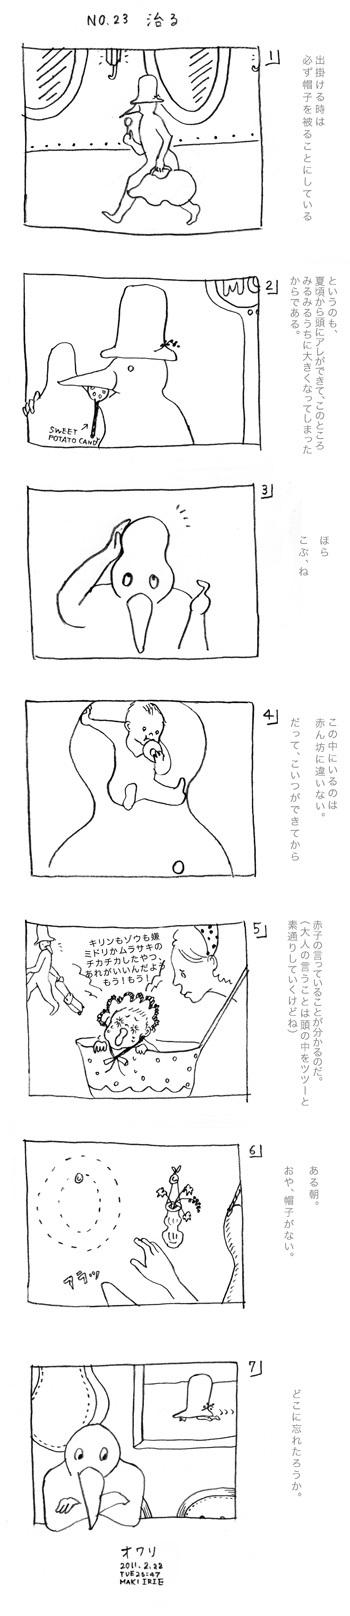 manga_23recovery.jpg